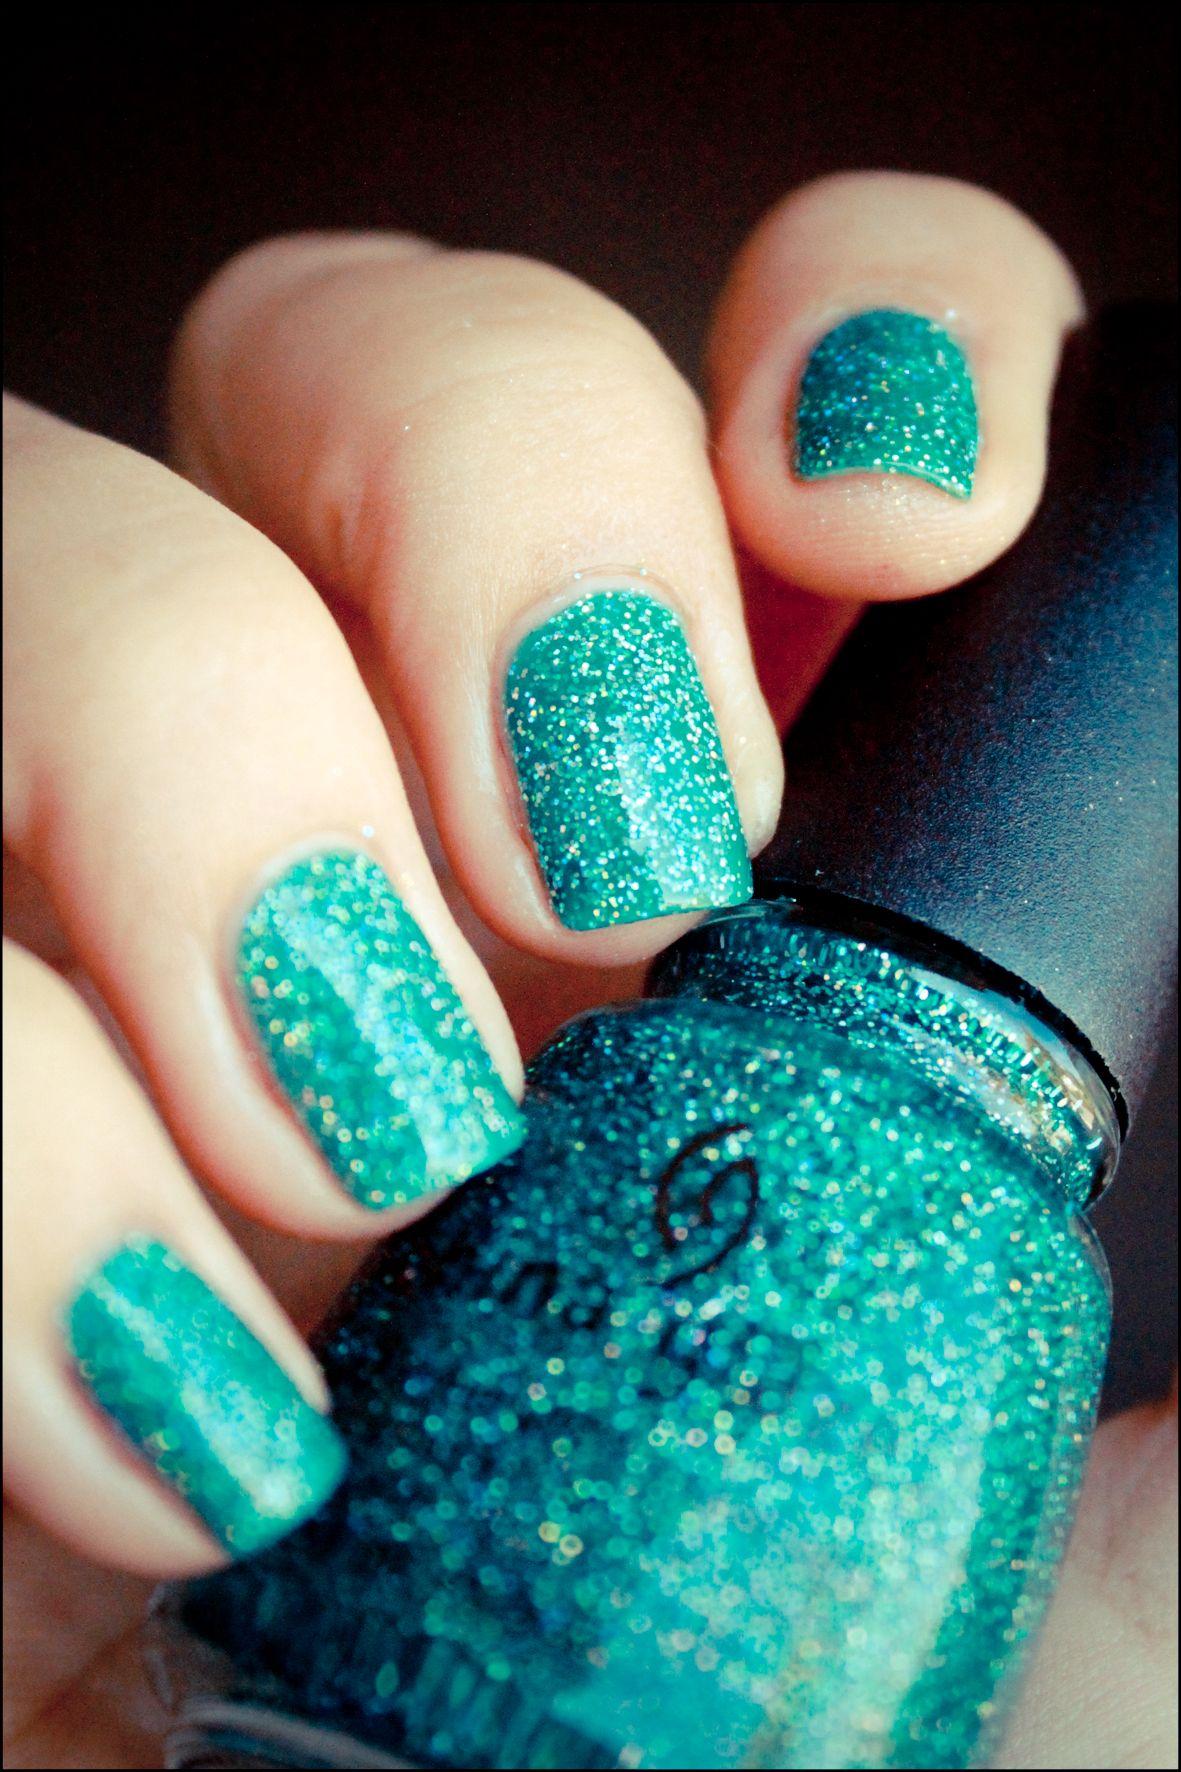 Uñas turquesas brillantes | fashion | Pinterest | Turquesa, Belleza ...